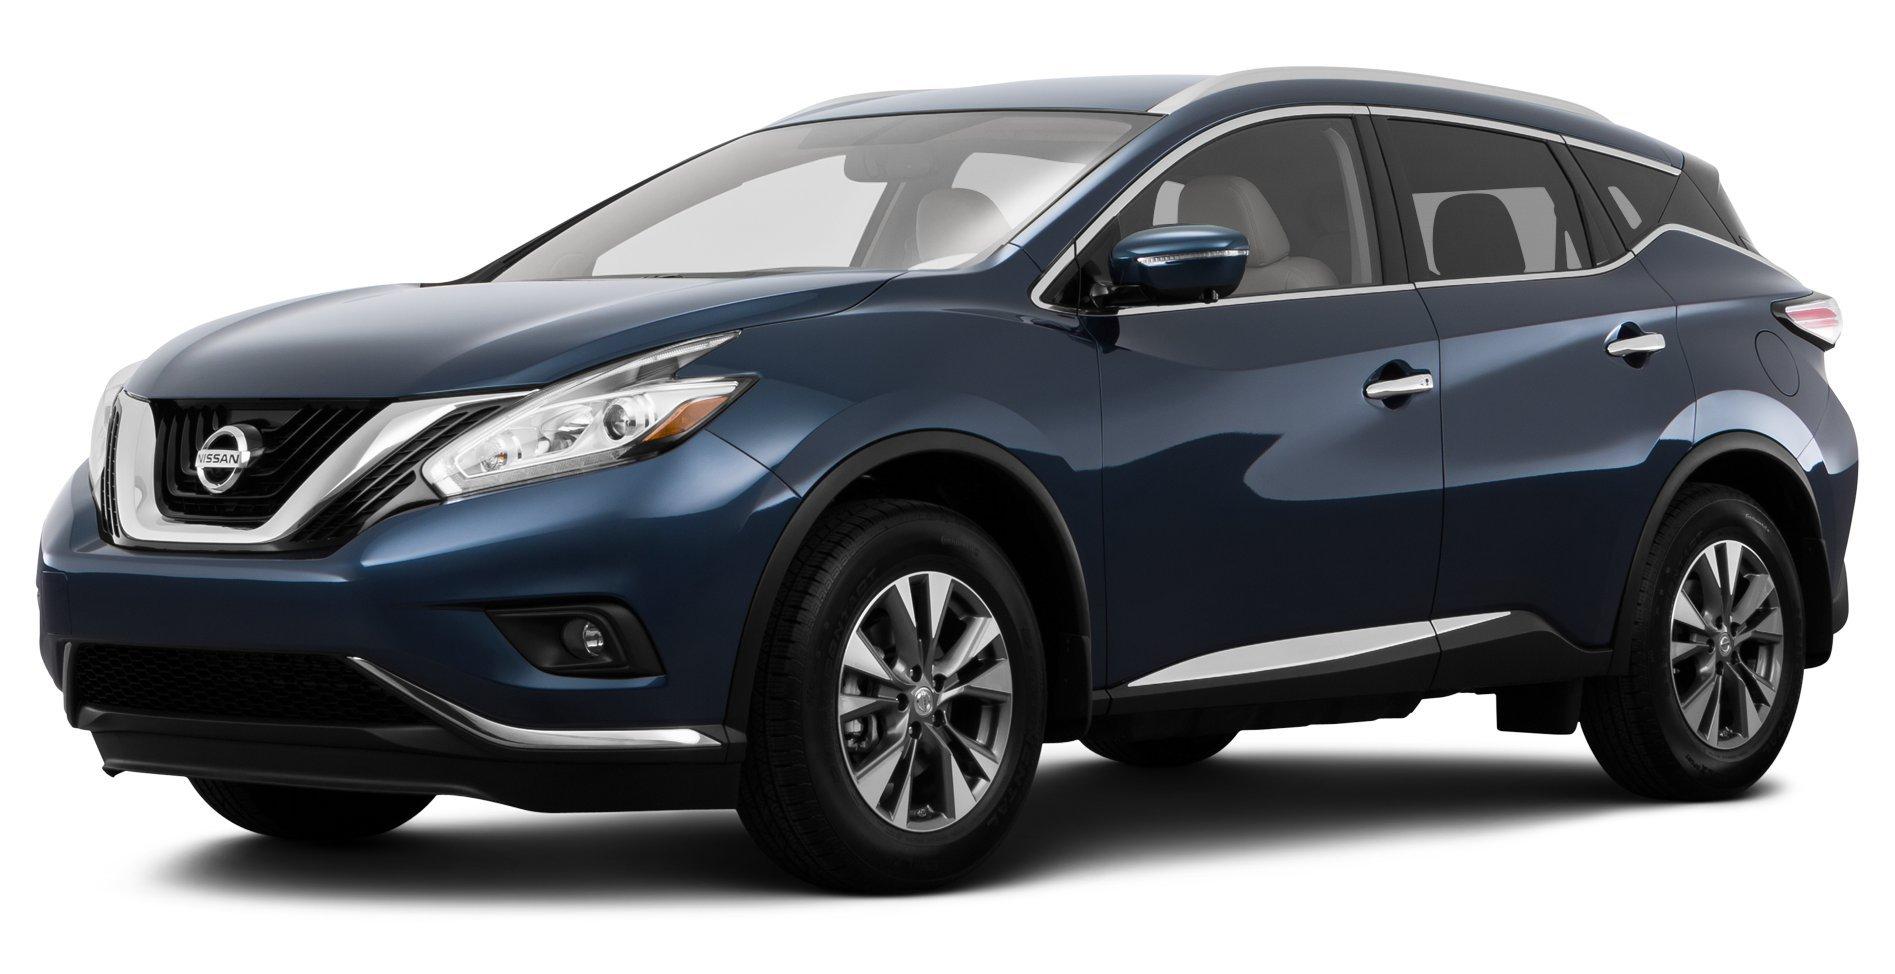 Nissan Murano Seating Capacity >> Amazon.com: 2015 Cadillac SRX Reviews, Images, and Specs: Vehicles